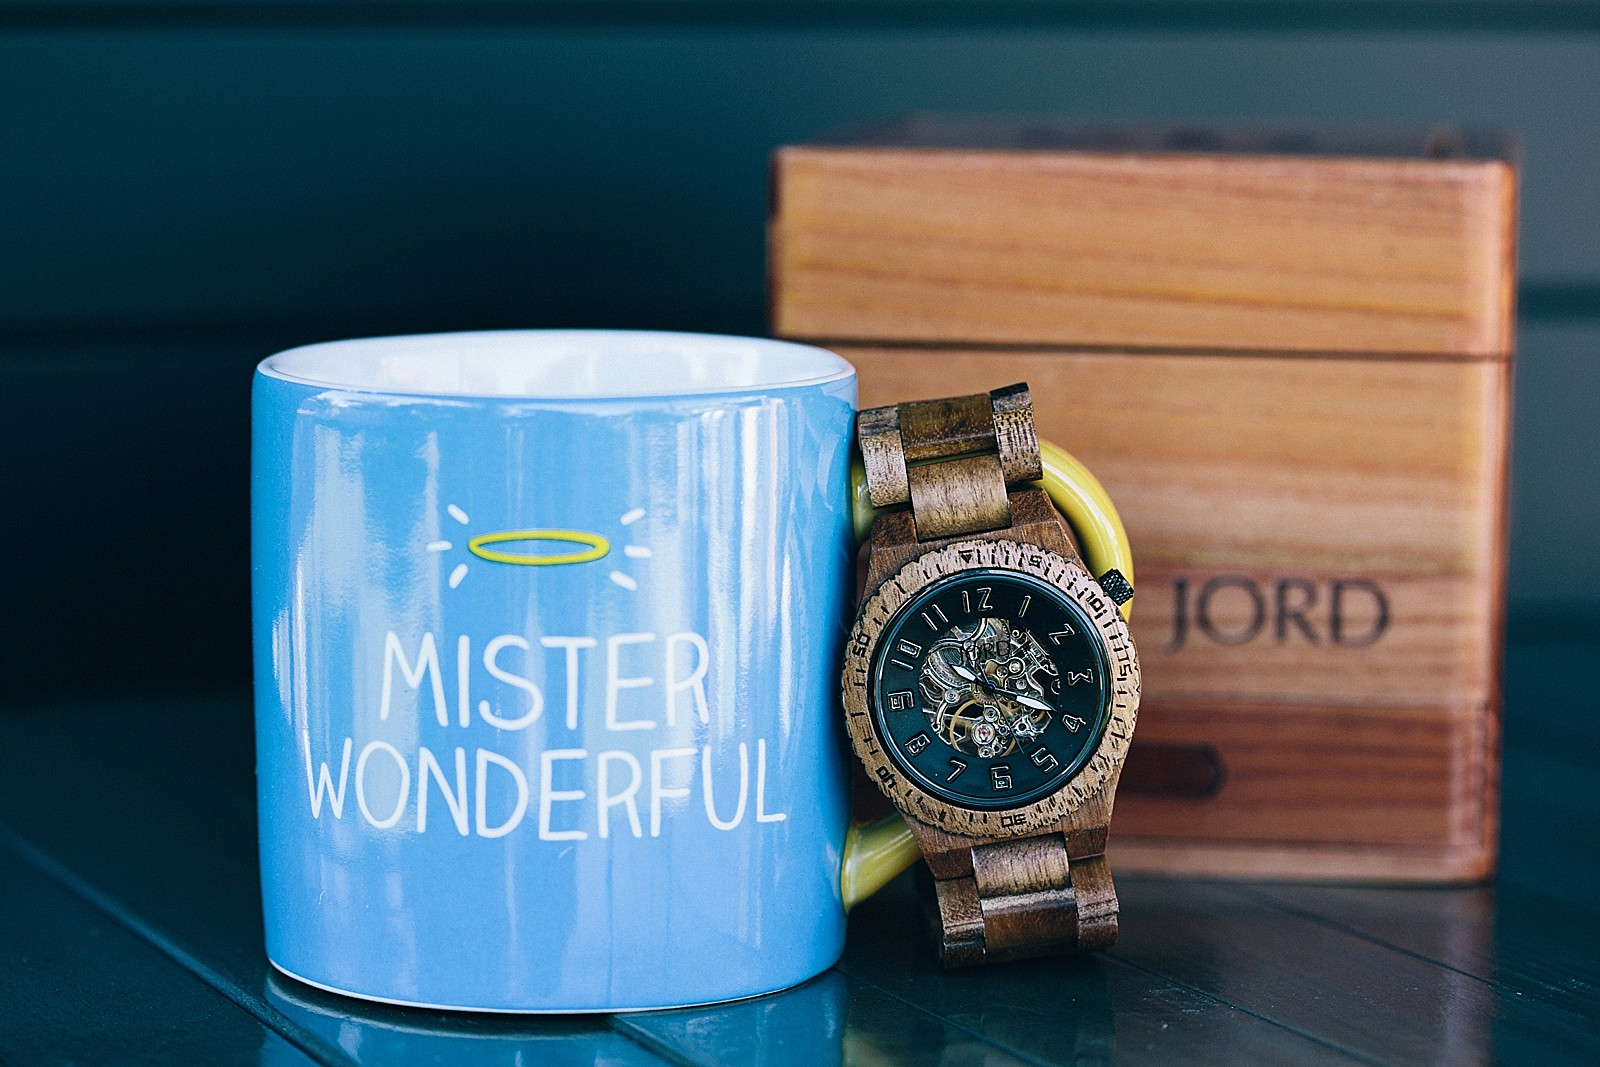 jord-wood-ladies-mens-wood-watch-unique-cool-gift-watch-1322